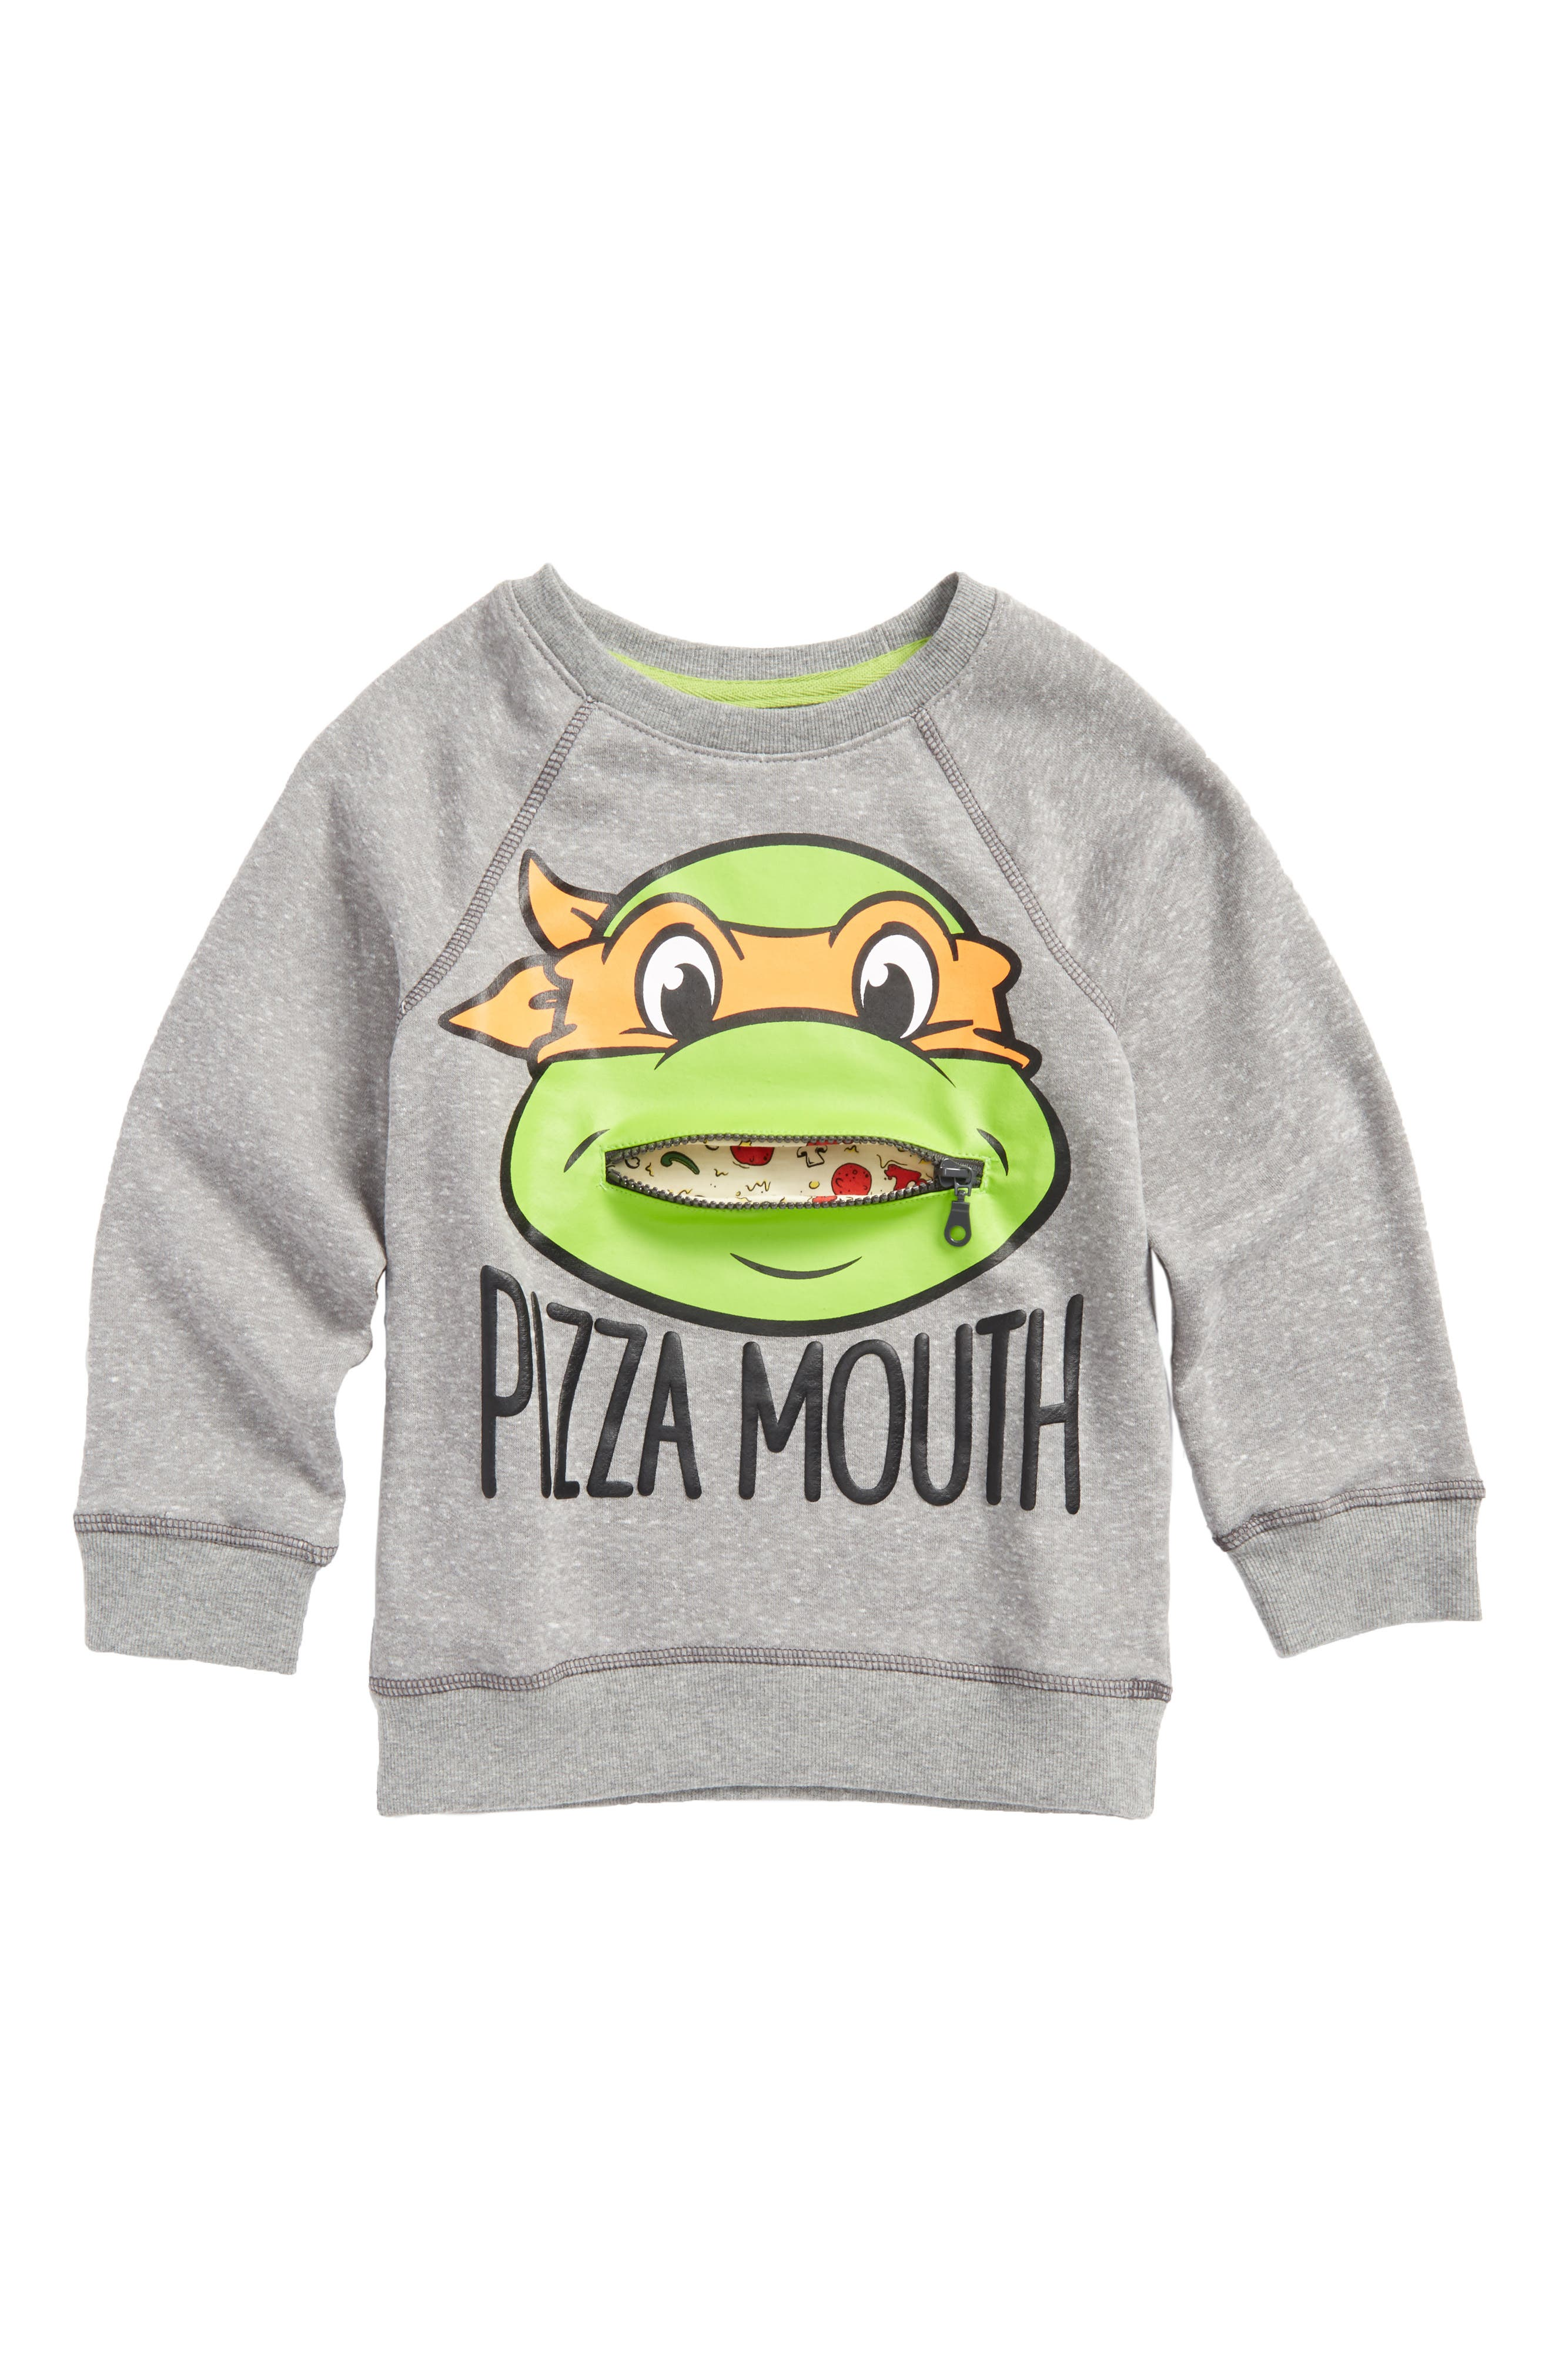 TMNT - Zipper Mouth Graphic Sweatshirt,                             Main thumbnail 1, color,                             050